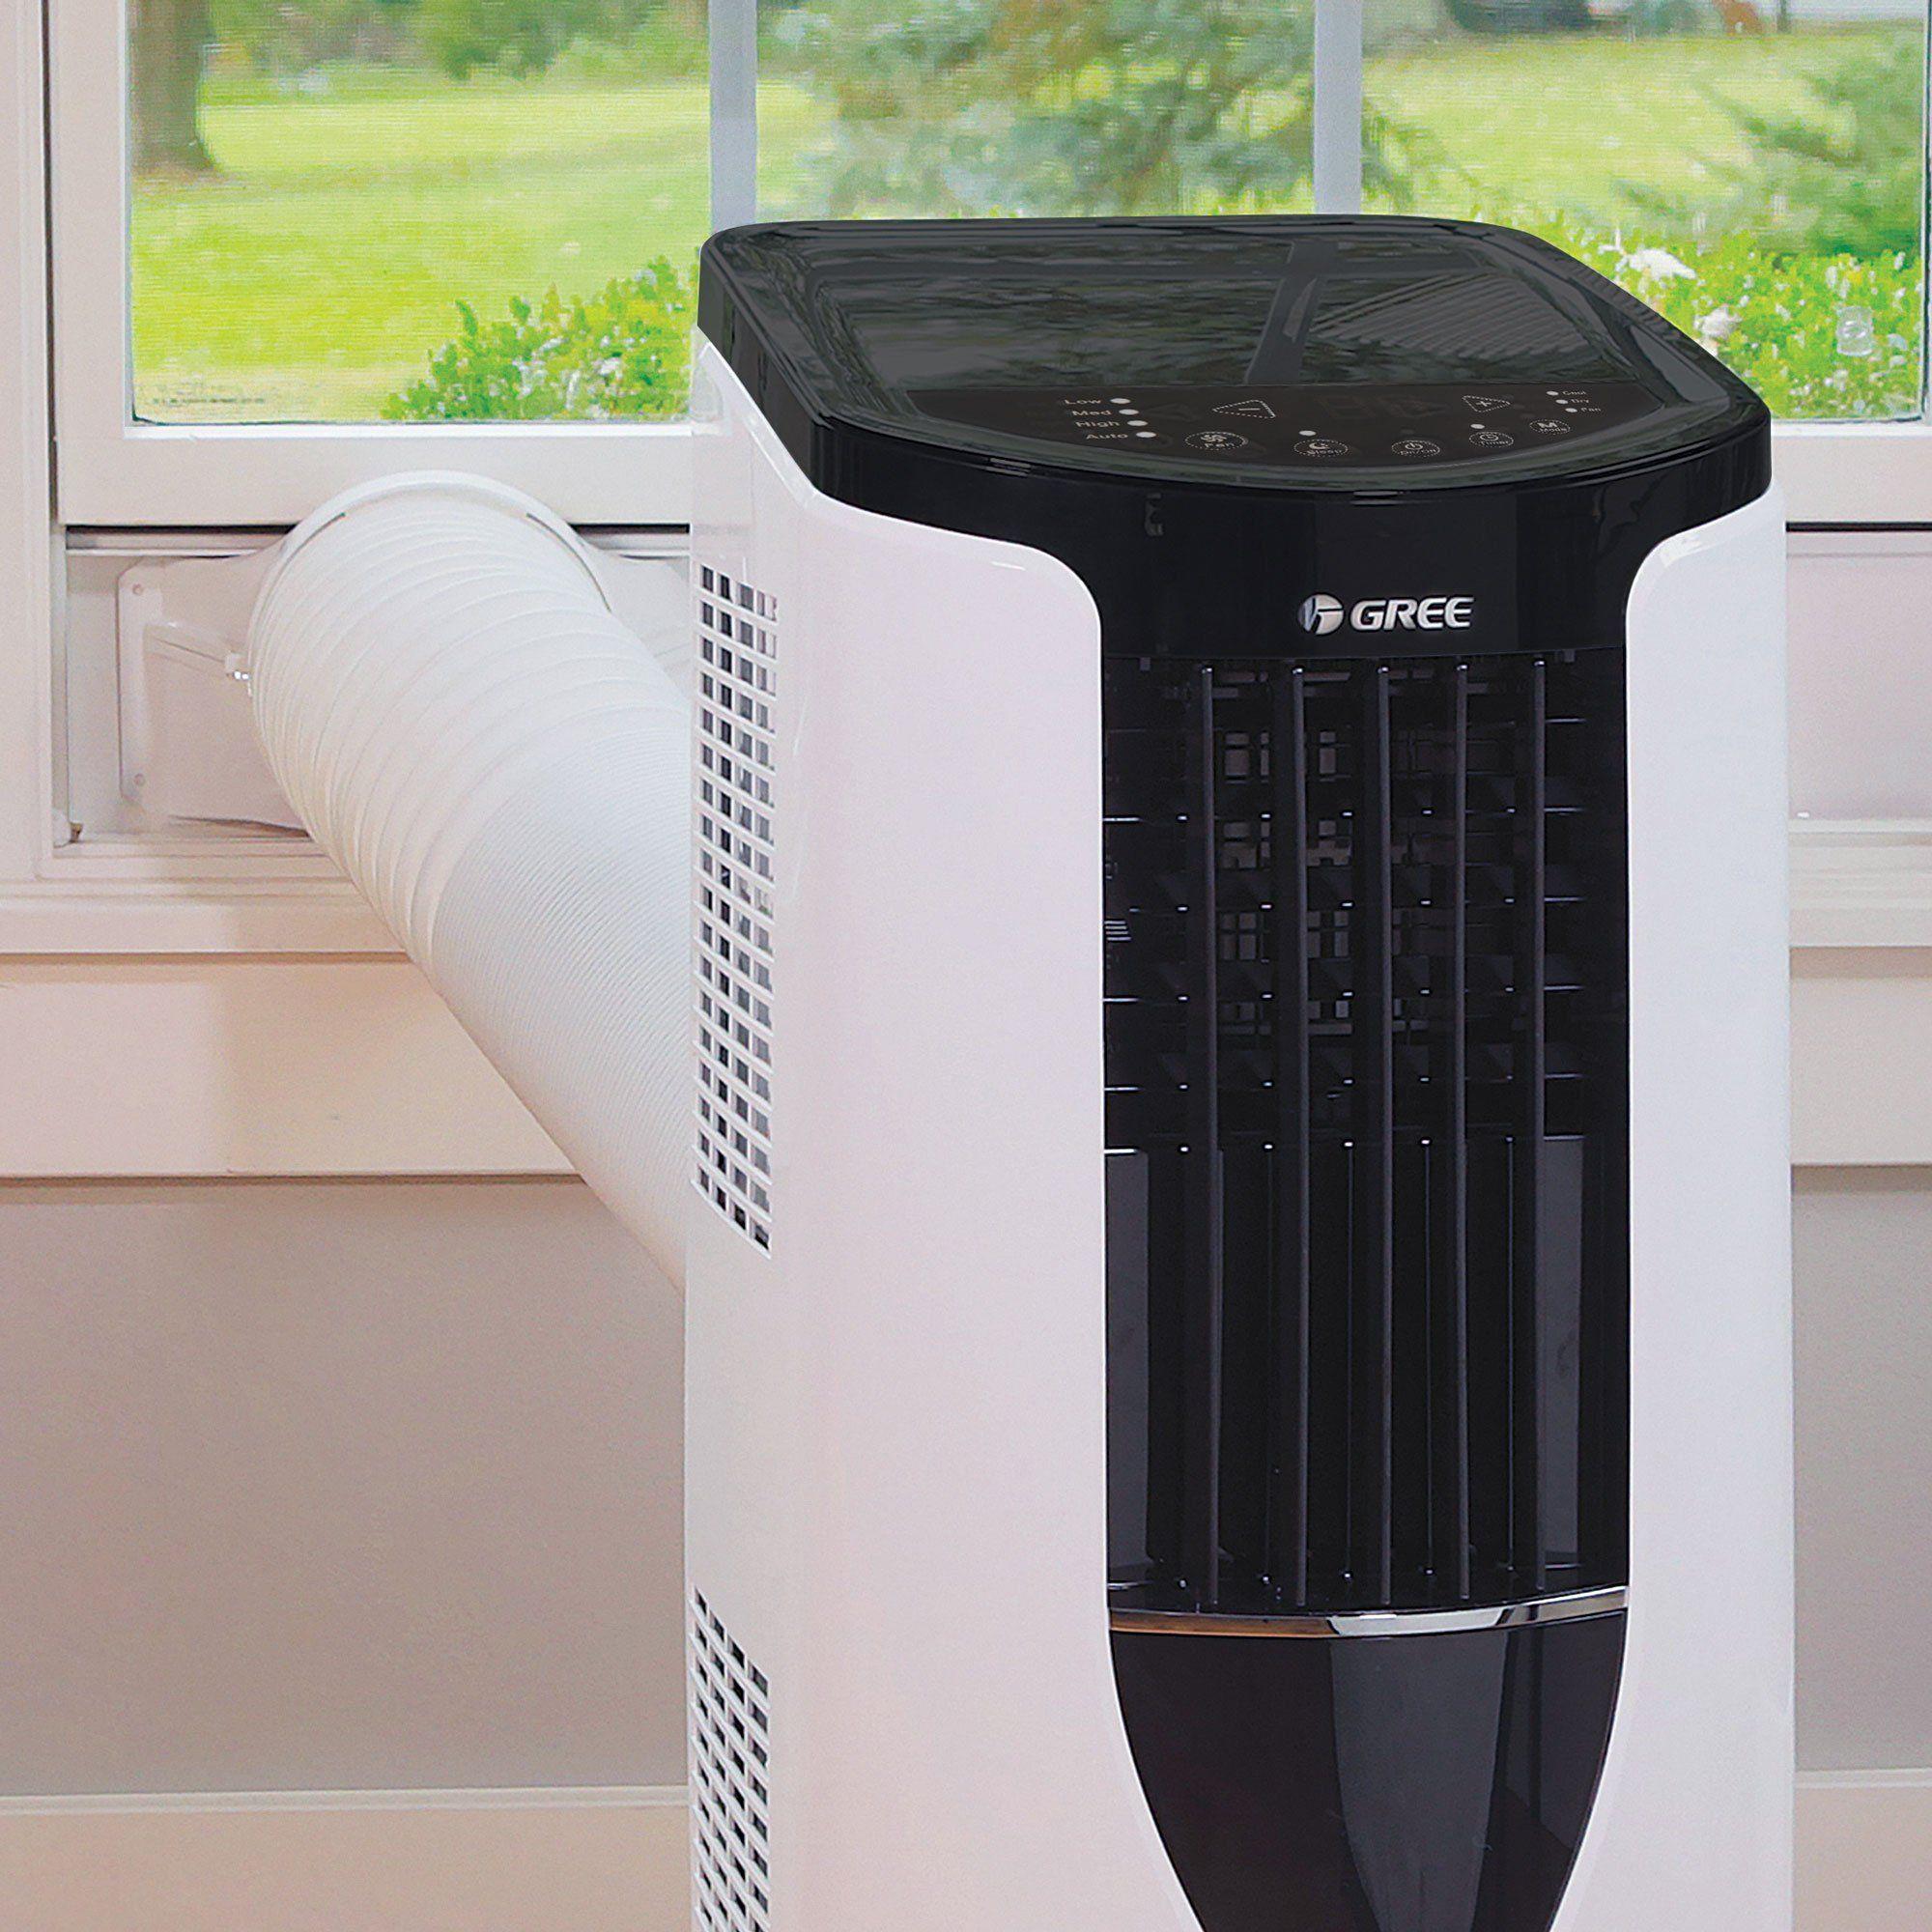 Gree 8000 BTU Portable Air Conditioner Certified